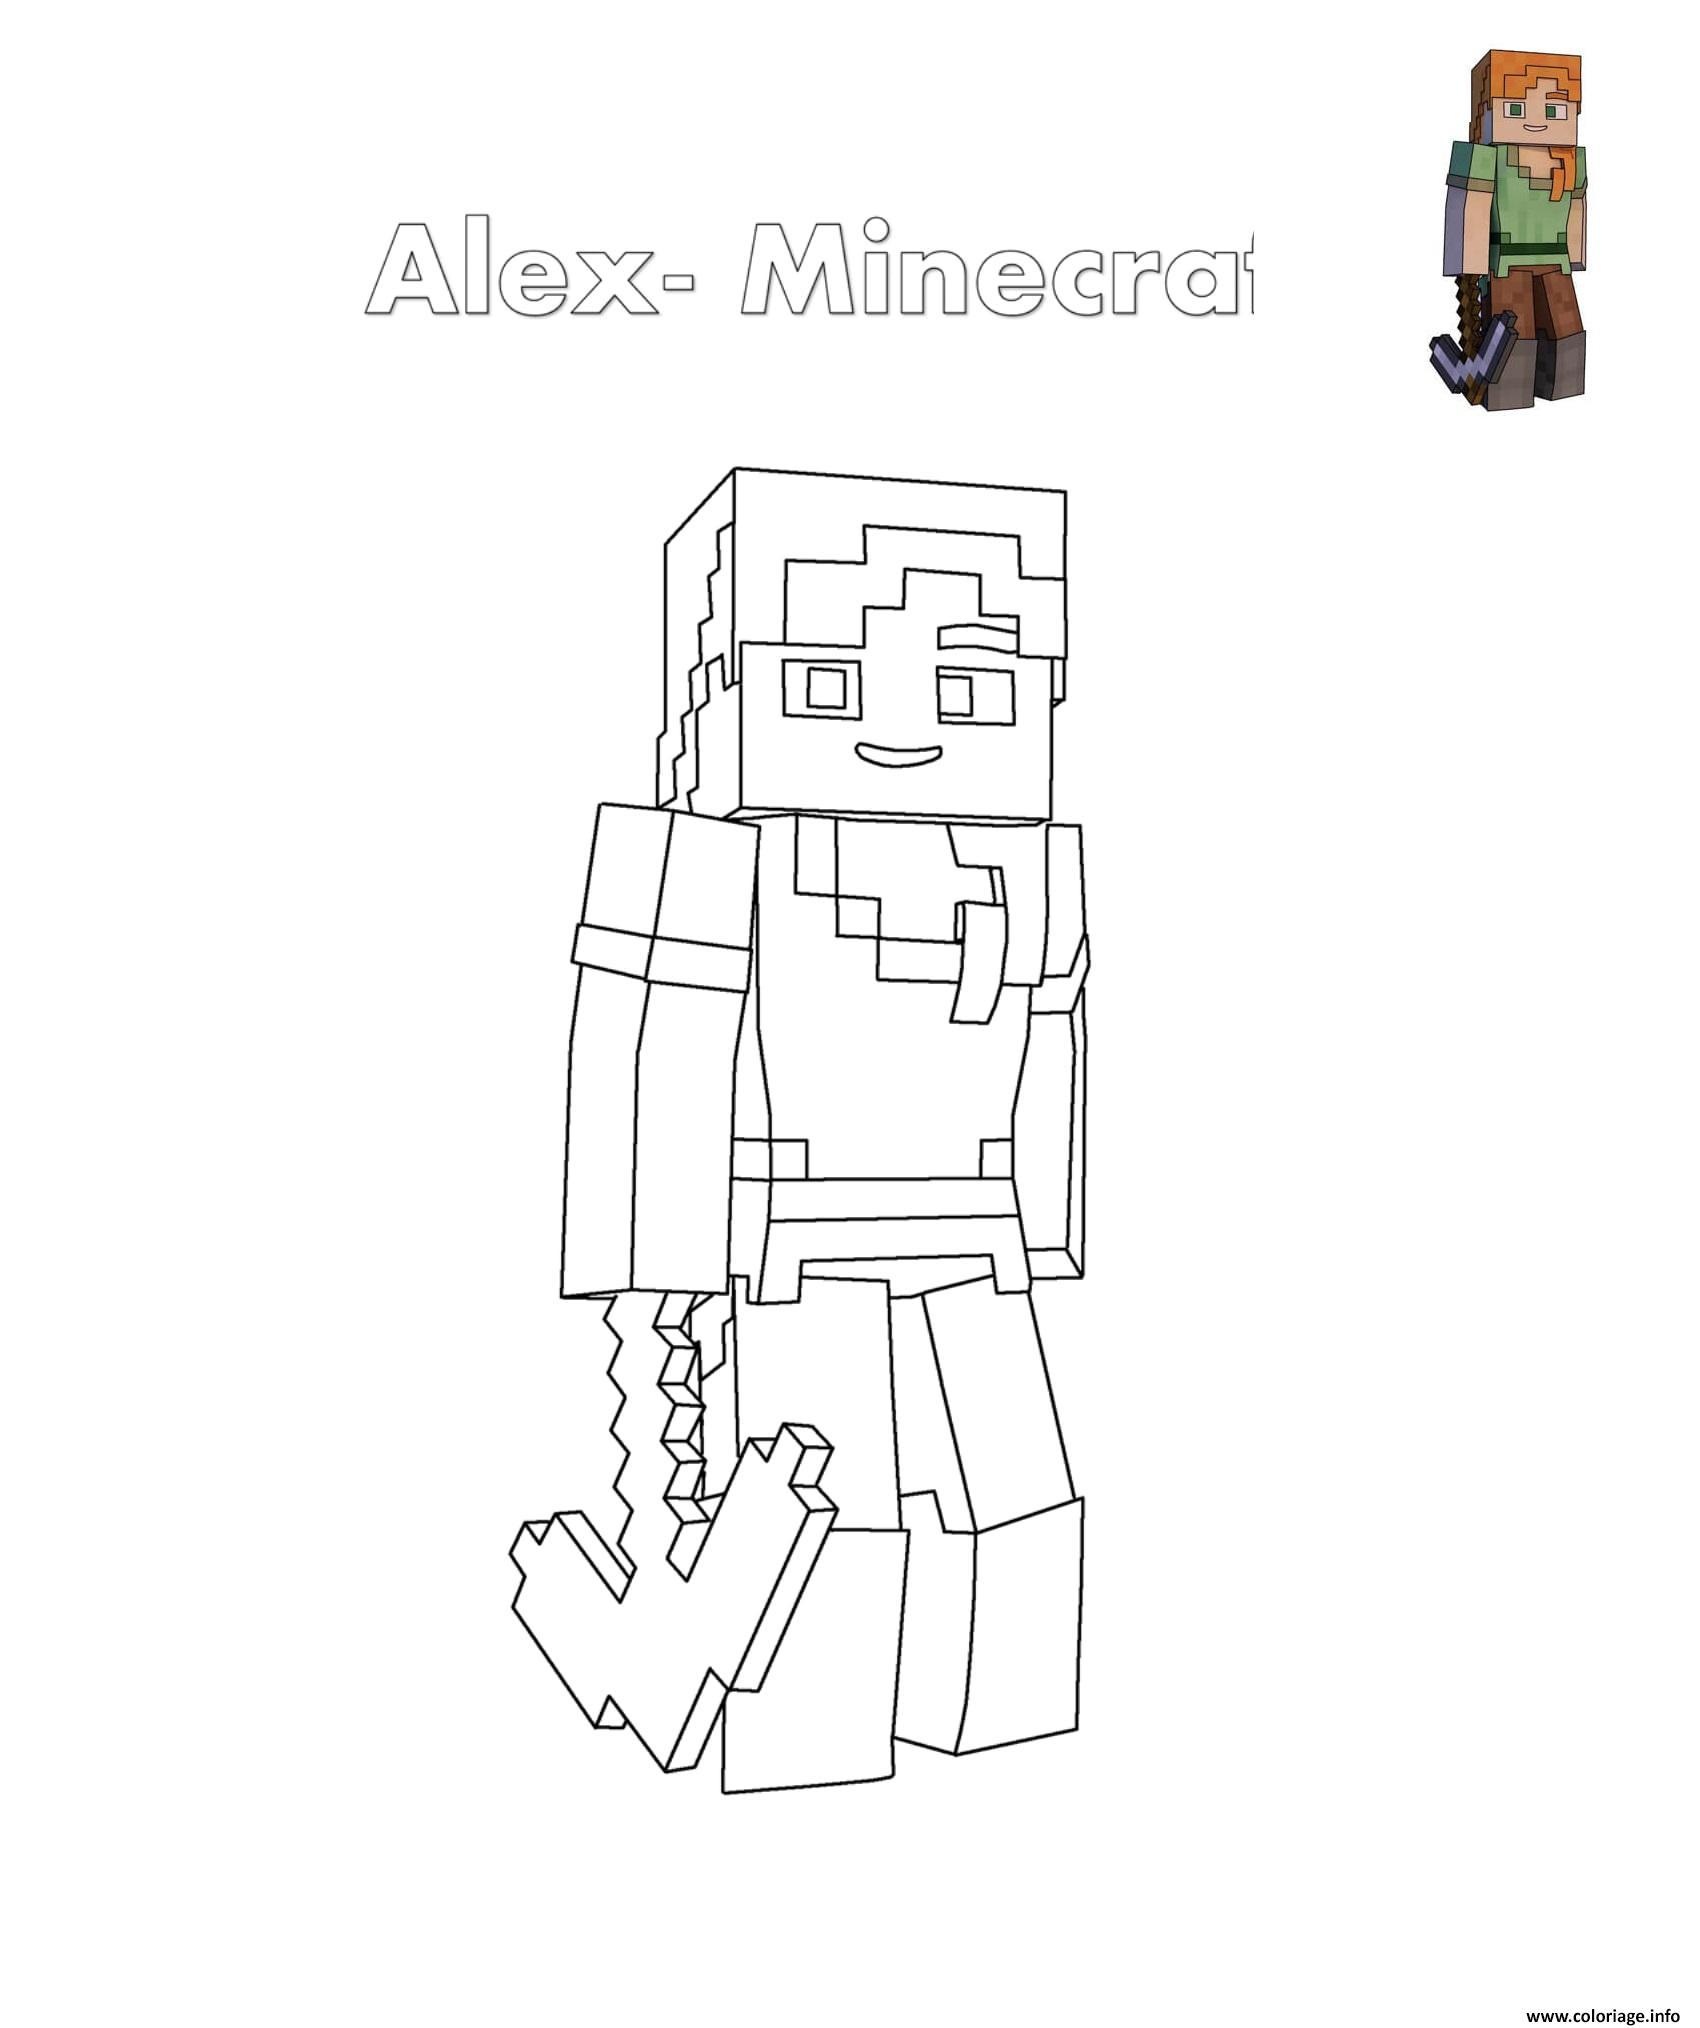 Dessin Alex de minecraft Coloriage Gratuit à Imprimer